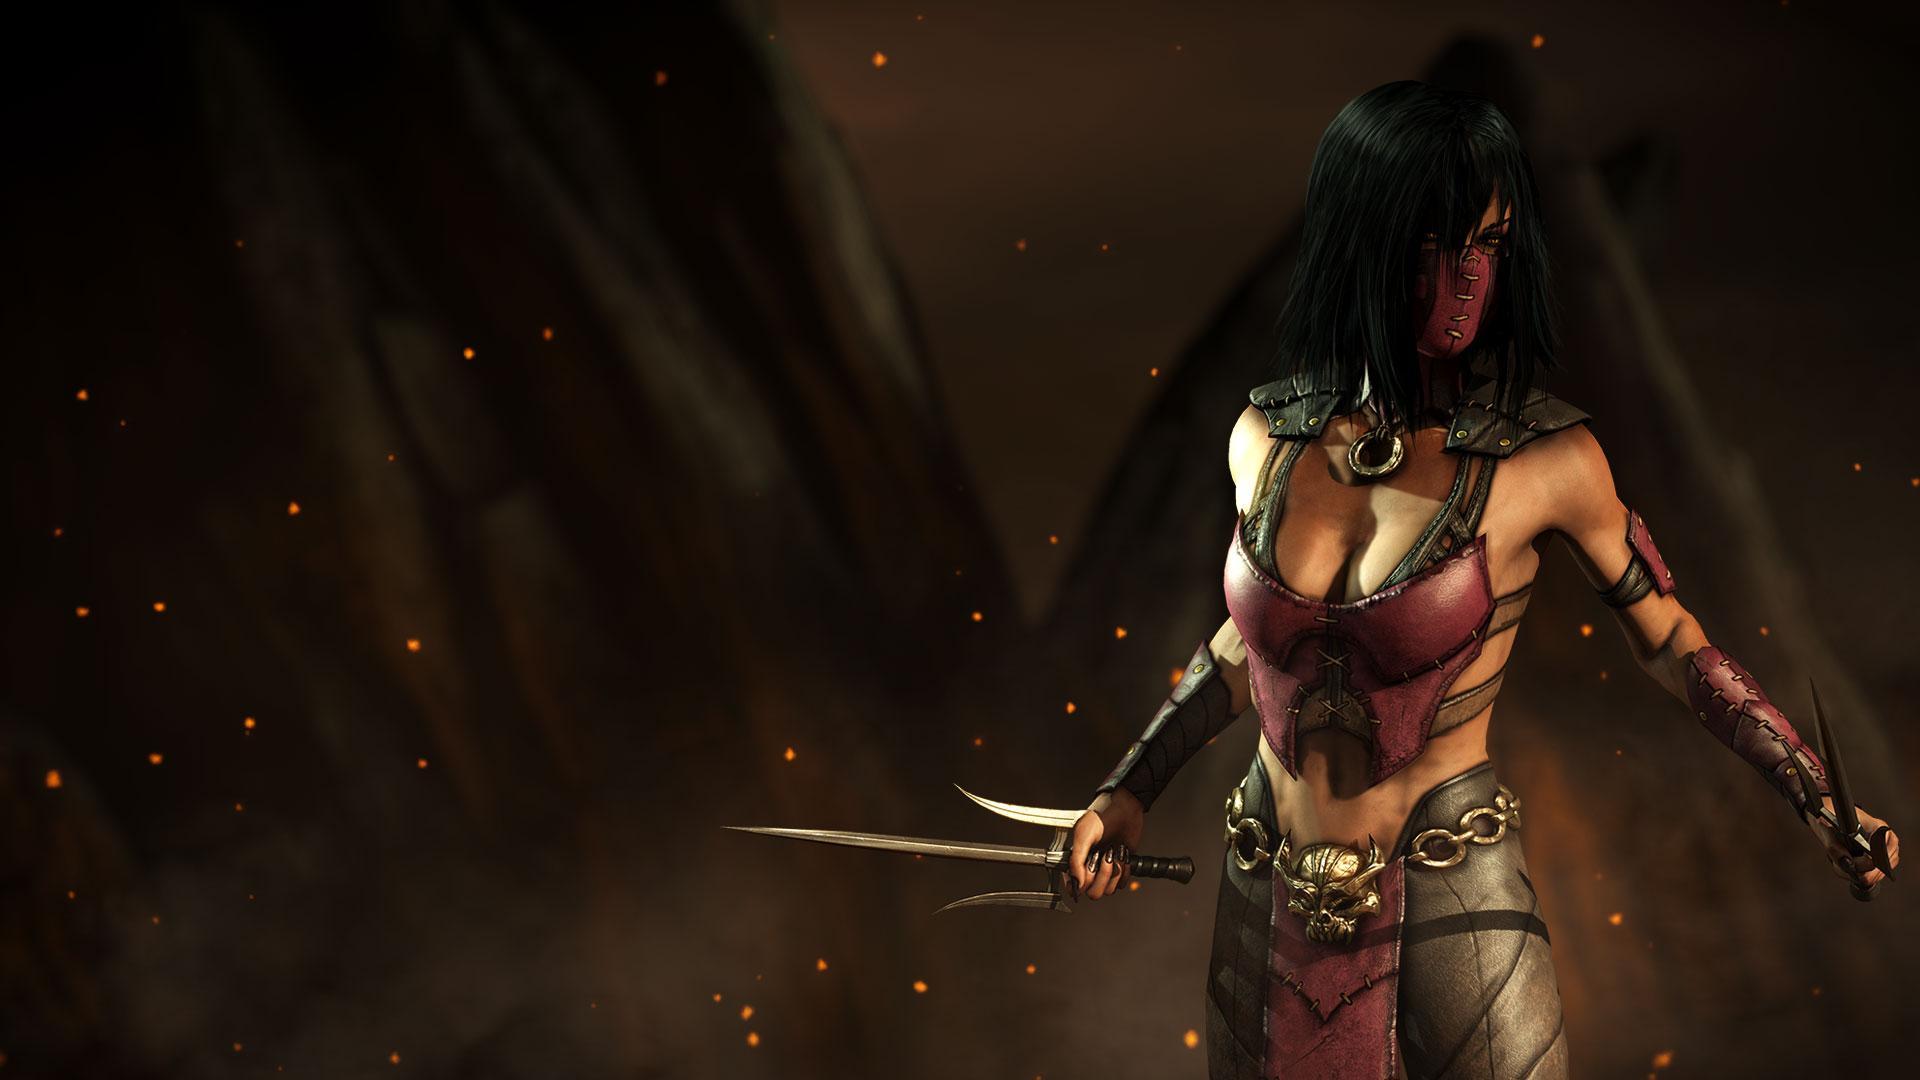 Mortal Kombat X Listing On Amazon Shows Characters Mileena Johnny